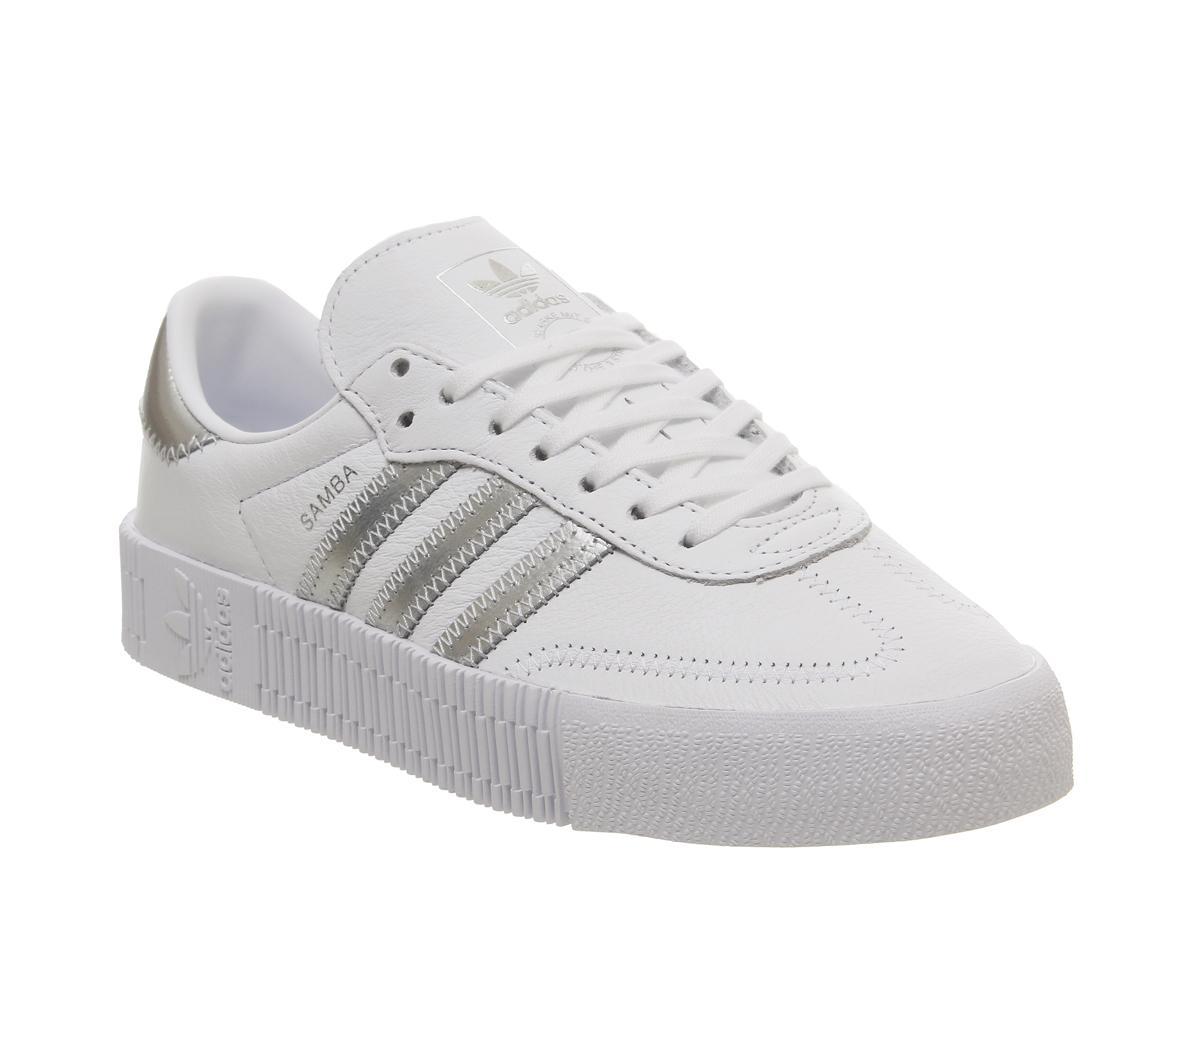 adidas Samba Rose Trainers White Silver